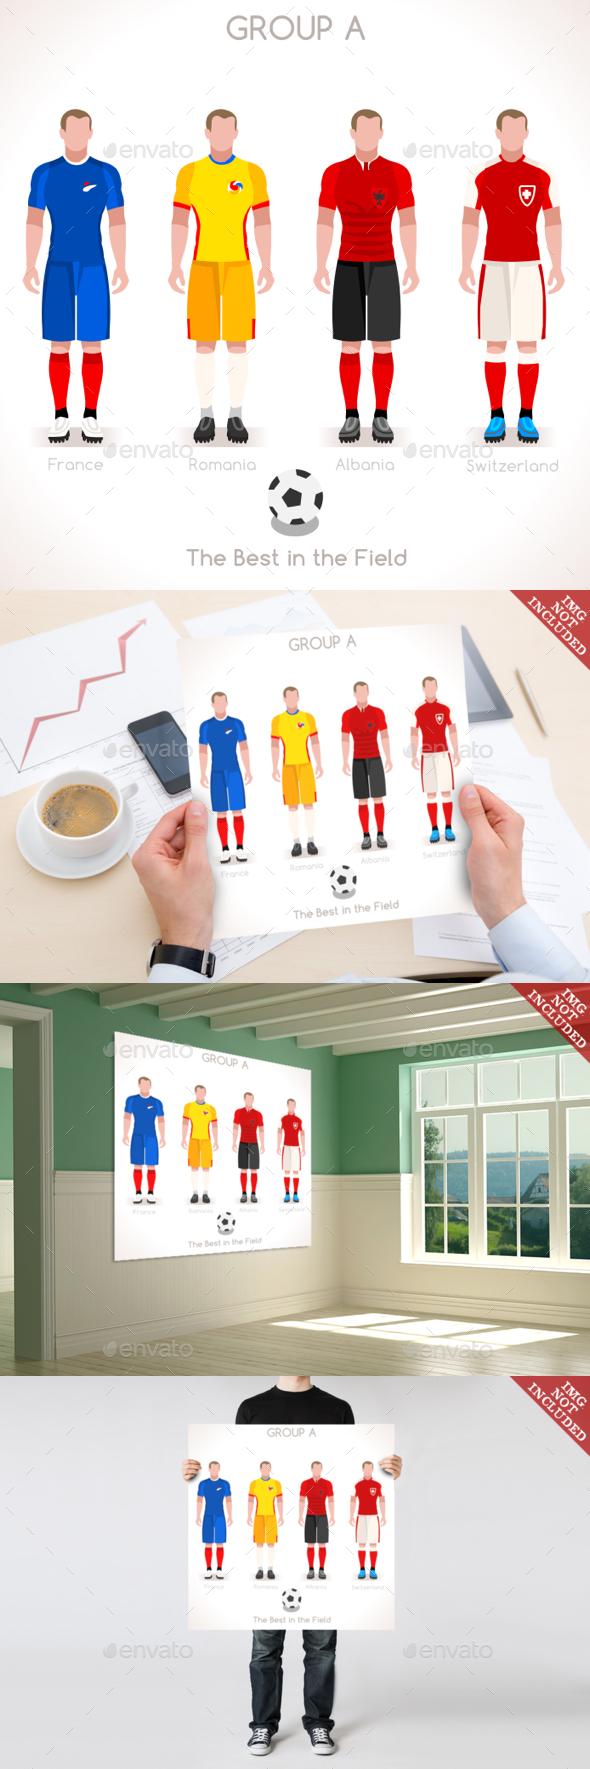 EURO 2016 GROUP A Championship - Sports/Activity Conceptual